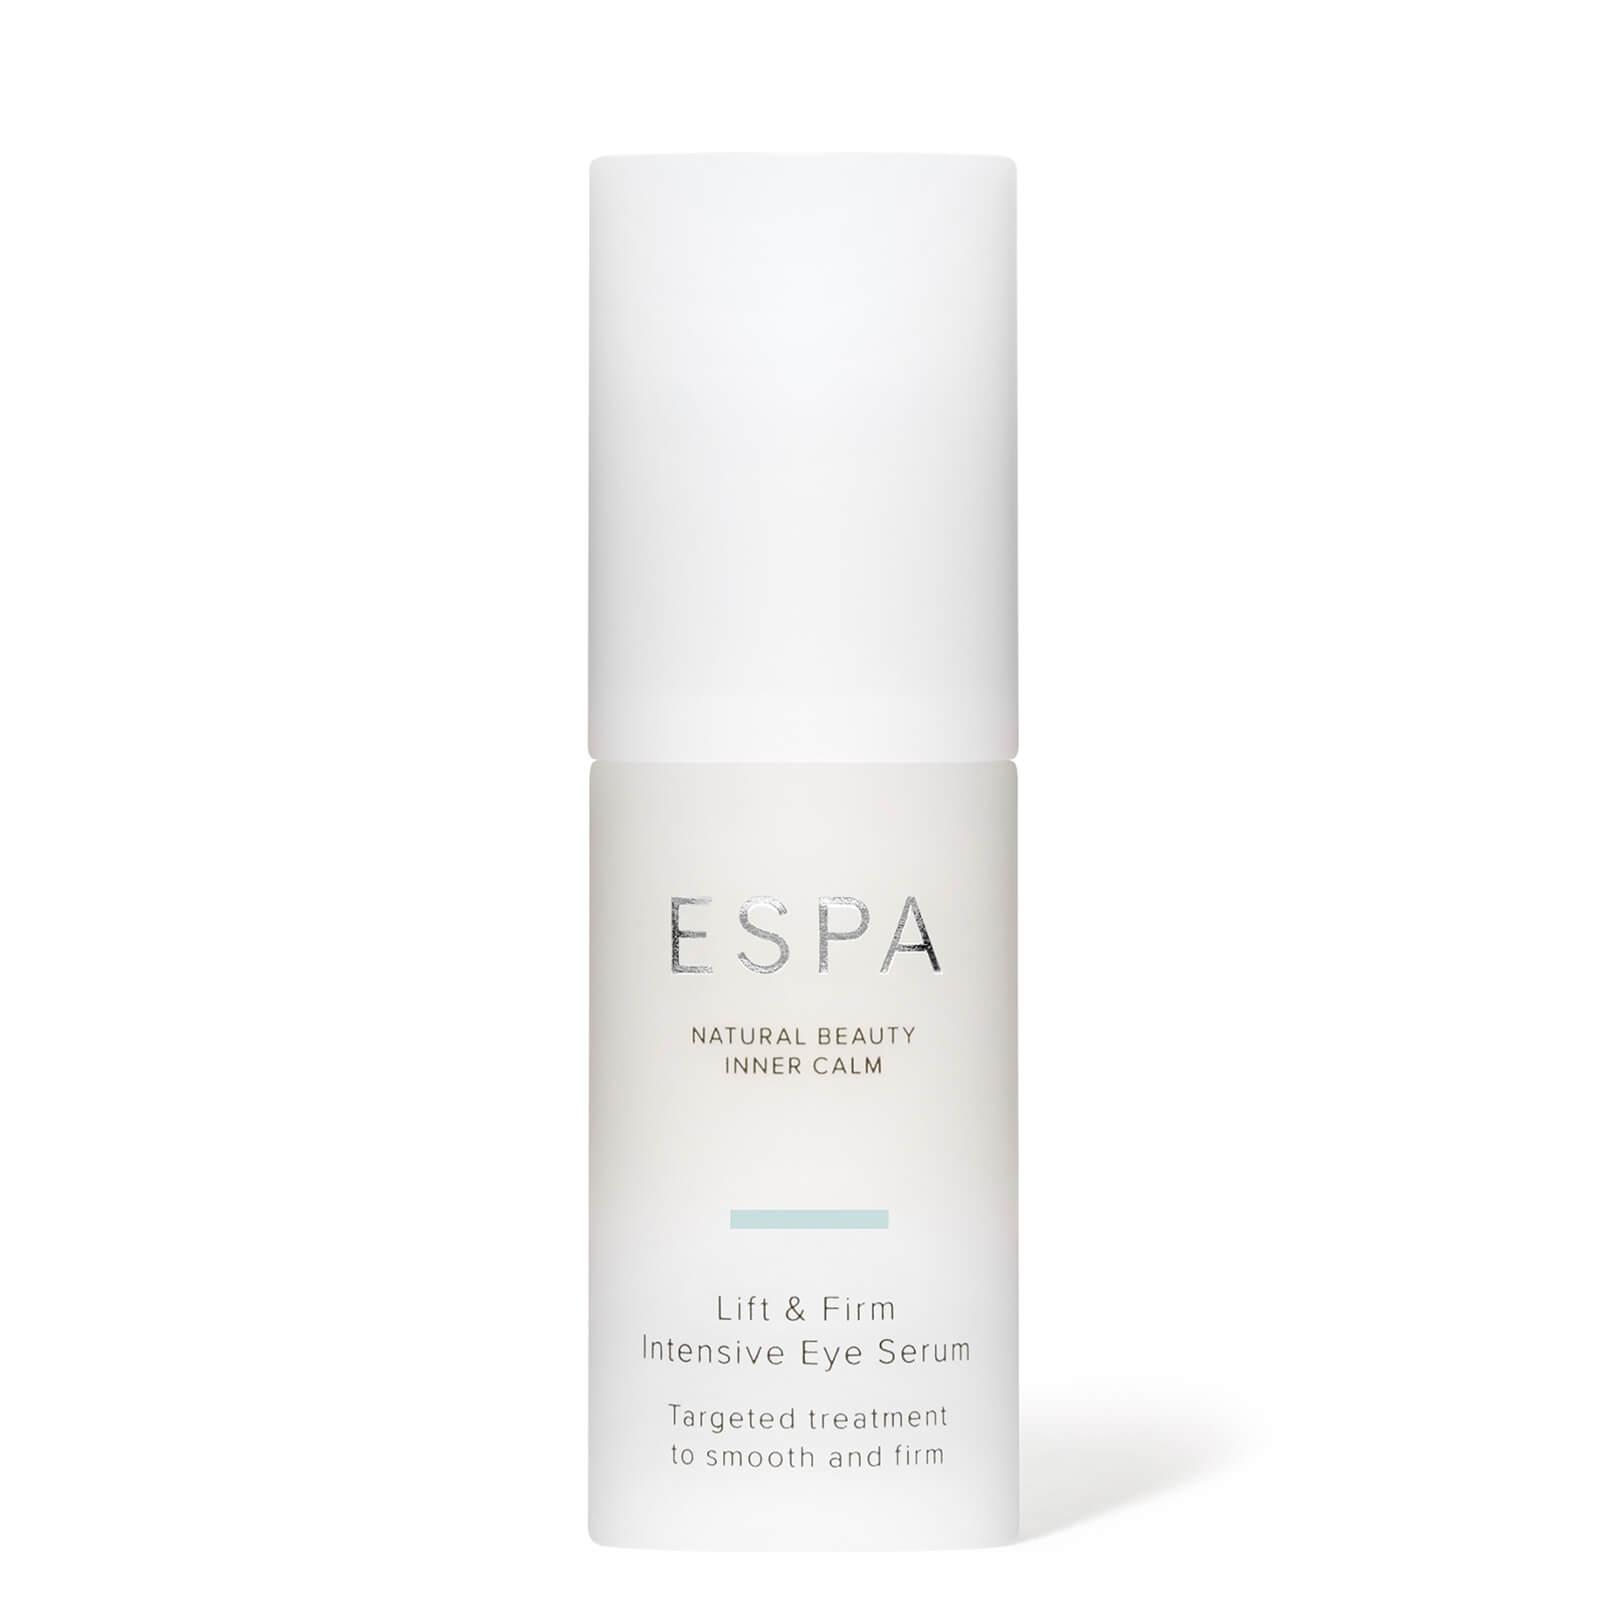 ESPA Lift & Firm Intensive Eye Serum 15ml